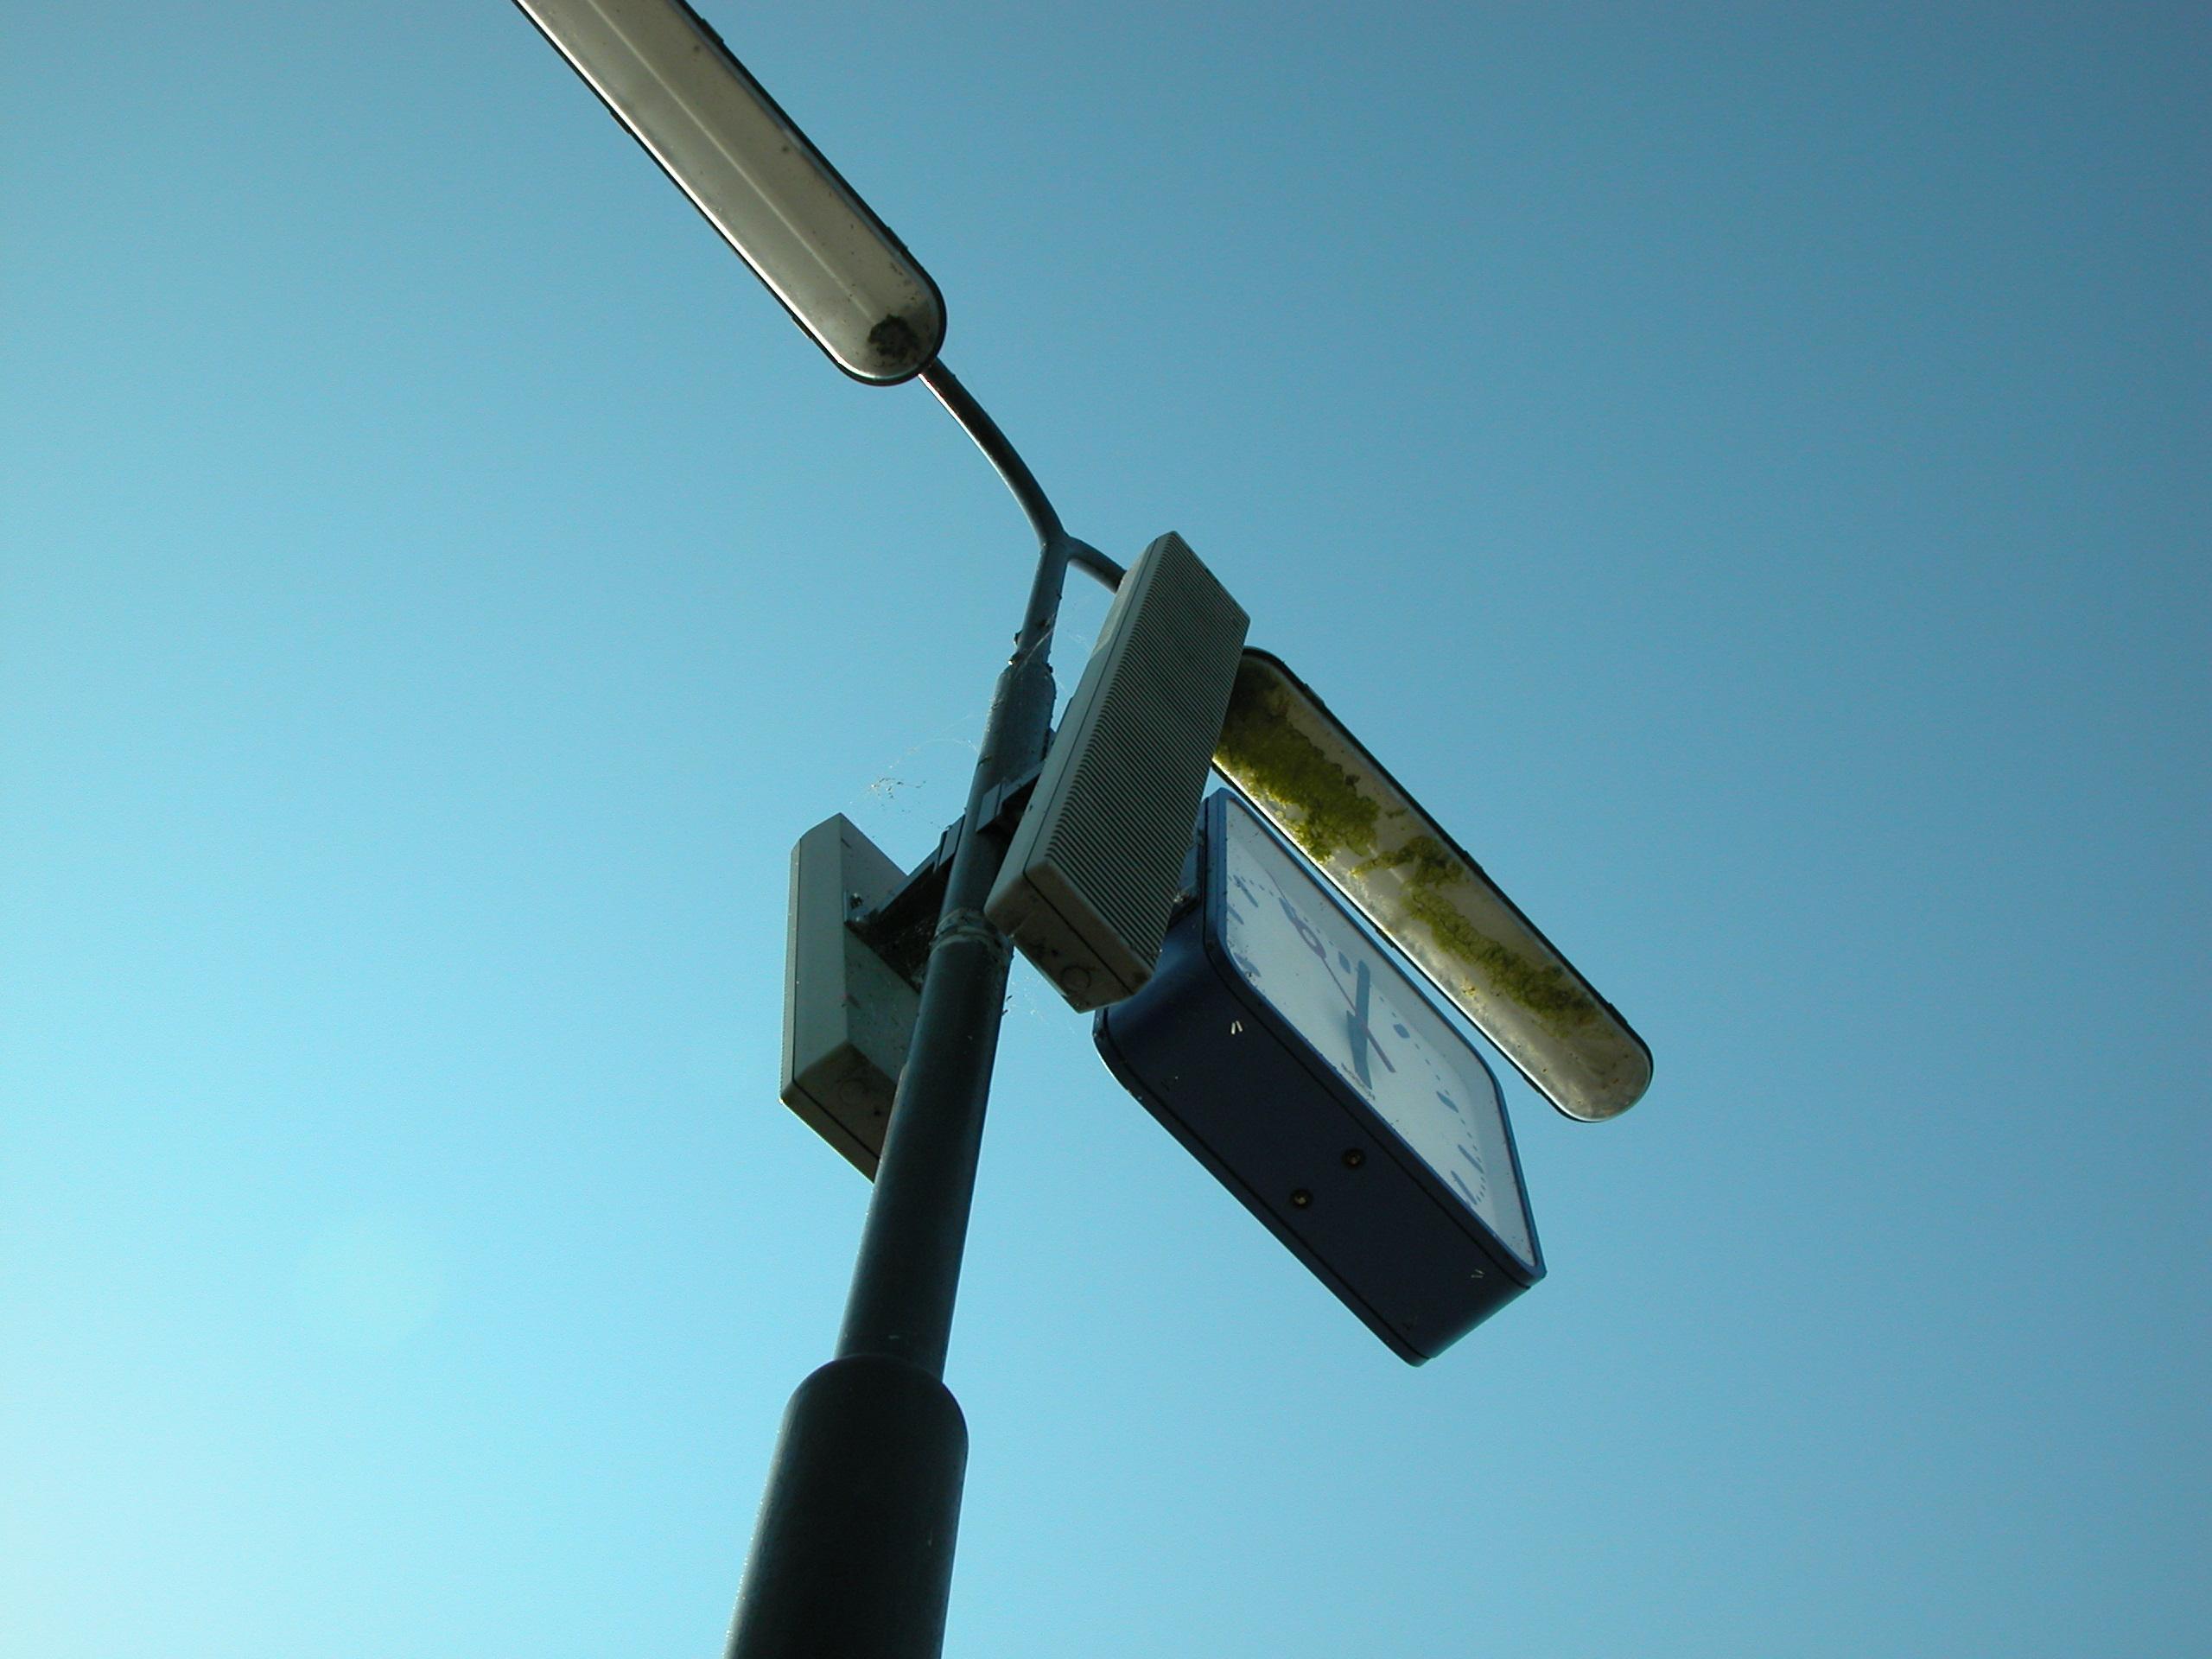 objects lamppost speaker speakers lamp clock time